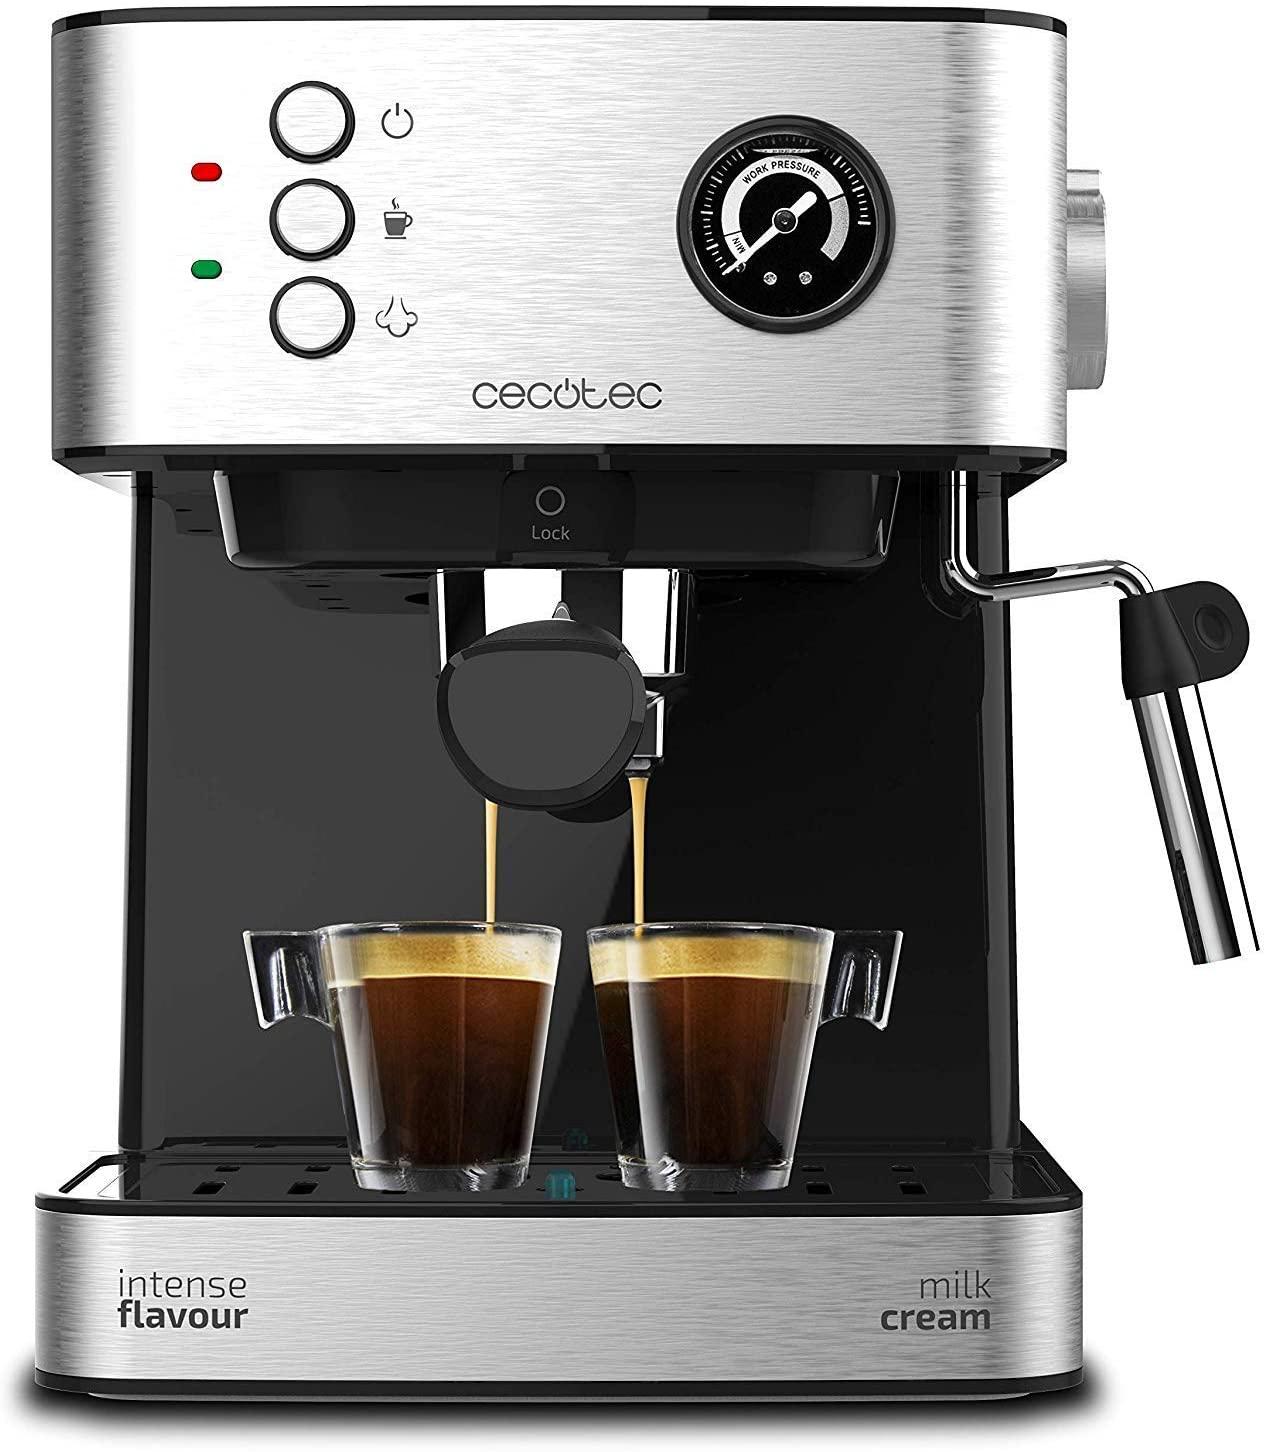 Cecotec Express Espresso 20 Koffiezetapparaat | voor Espresso en Cappuccino @Amazon.es